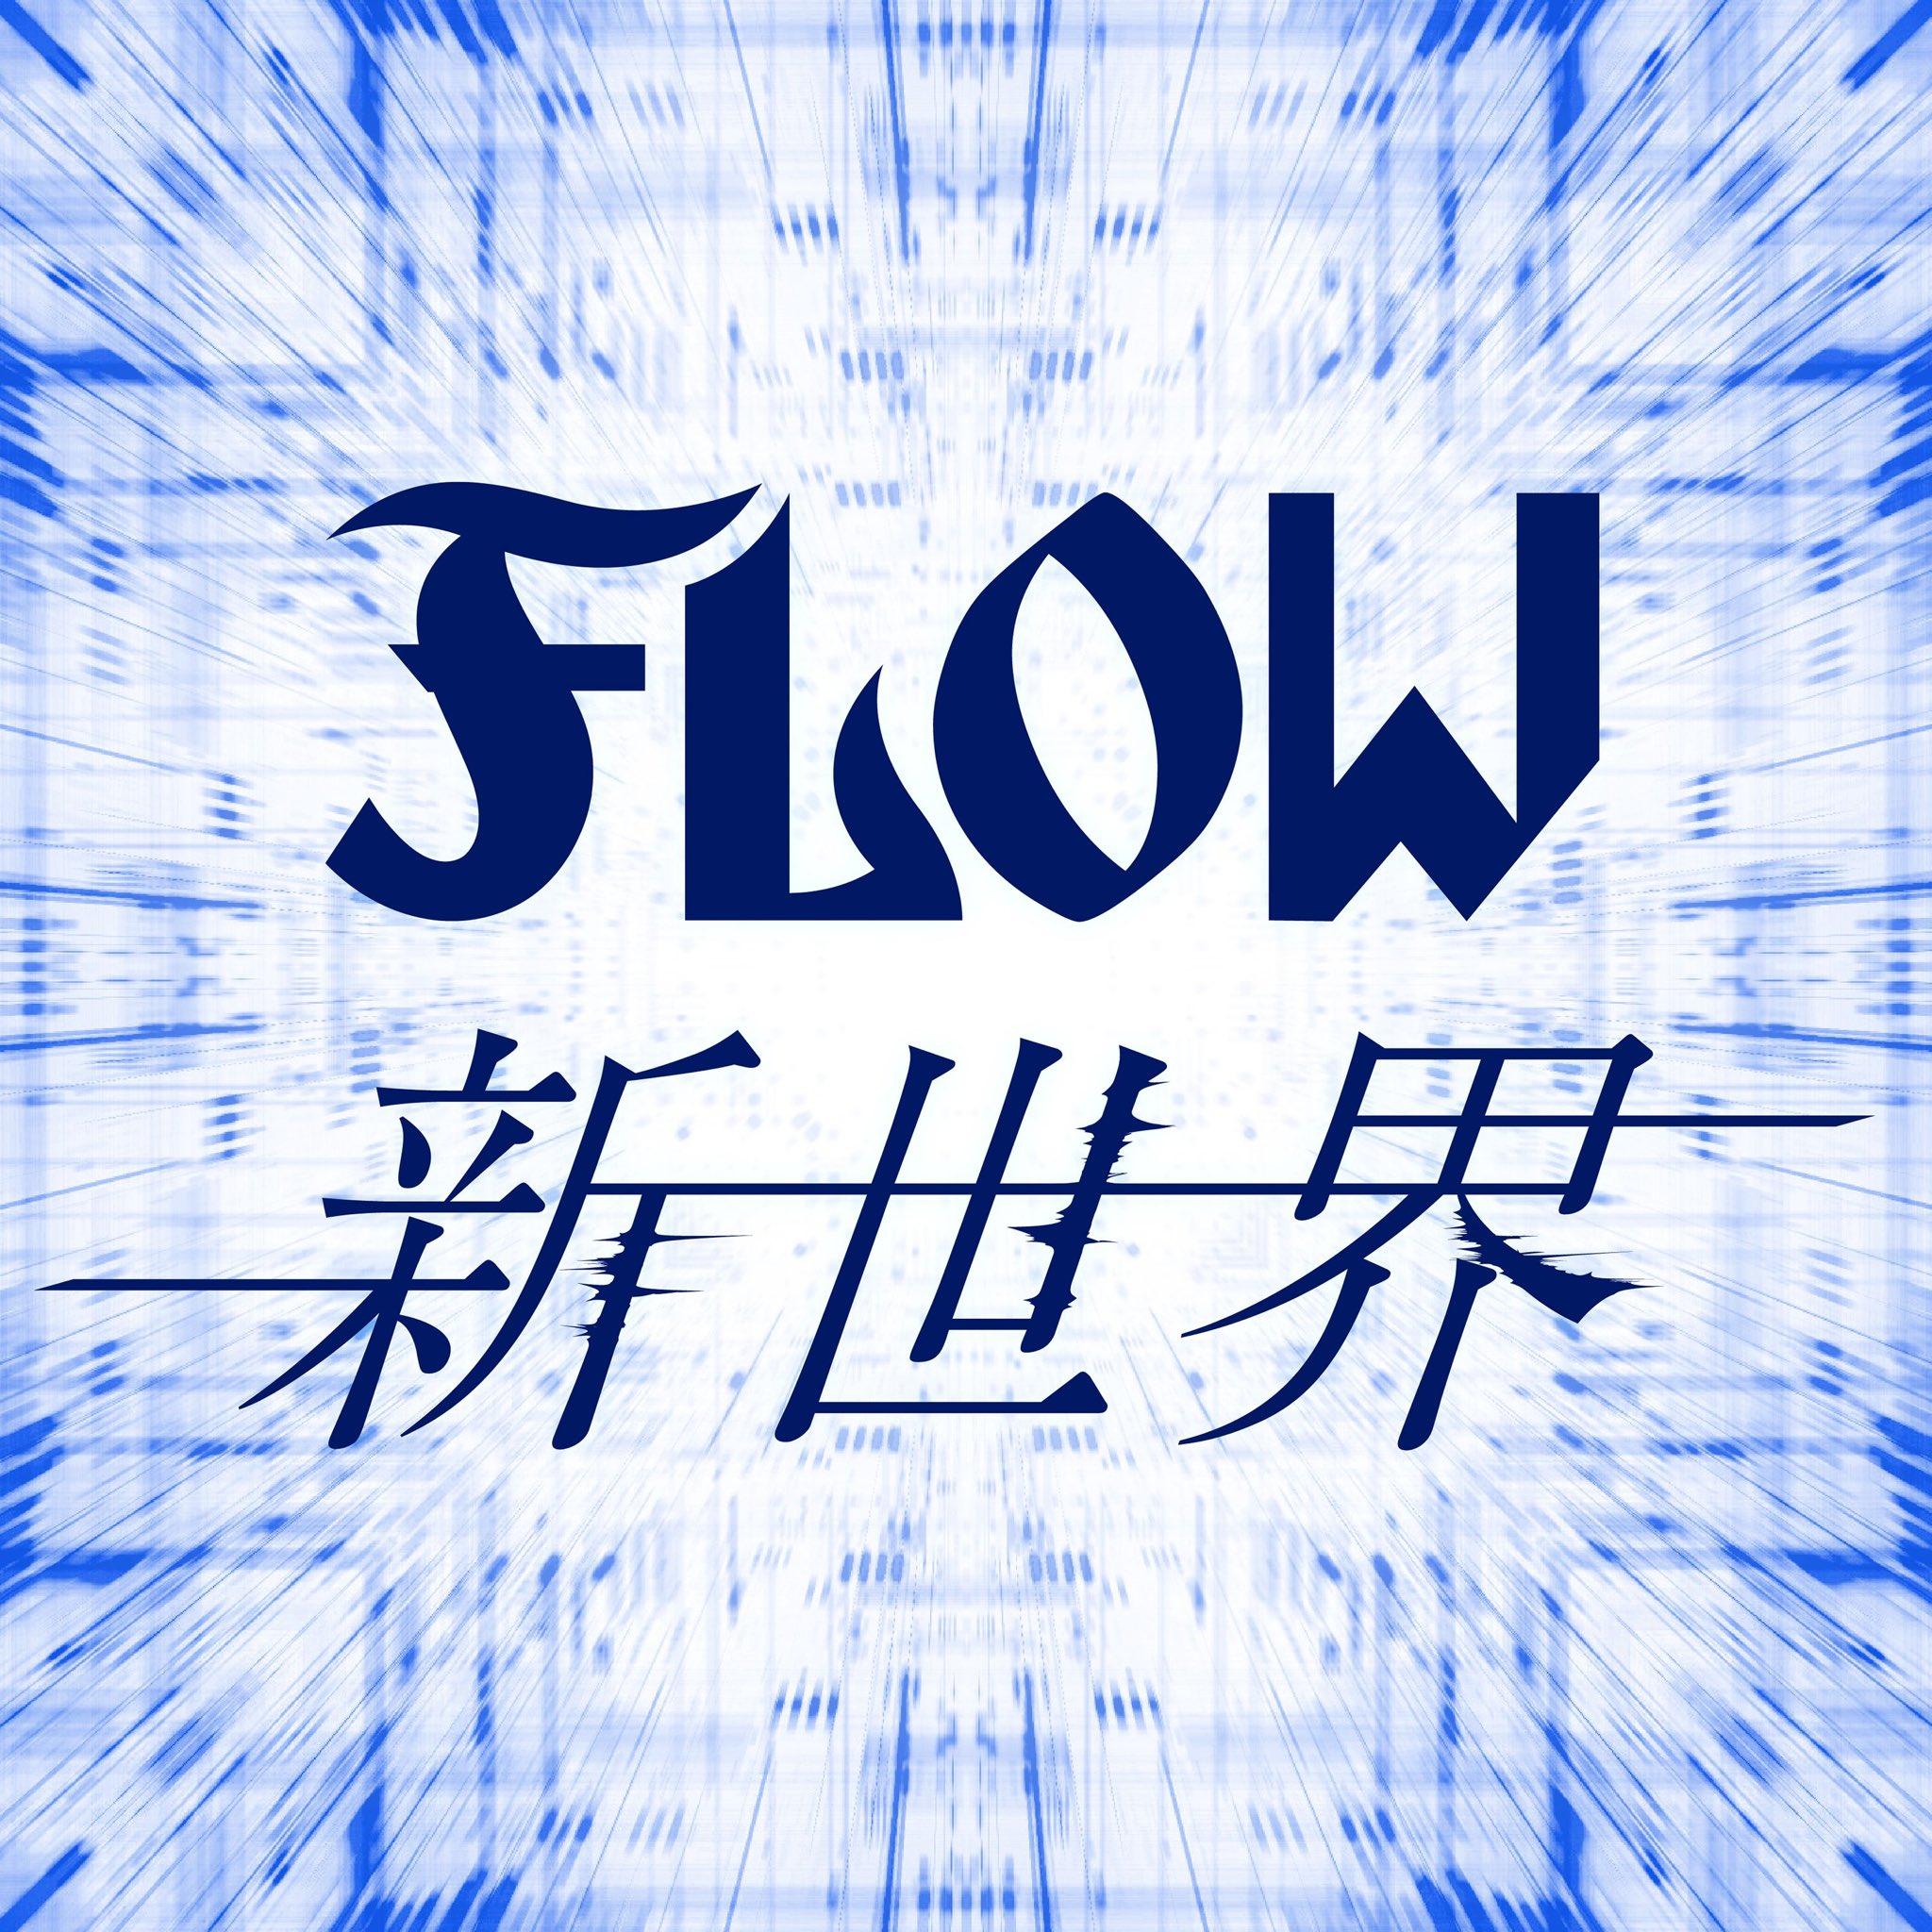 FLOW - 新世界 [2020.10.06+MP3+RAR]